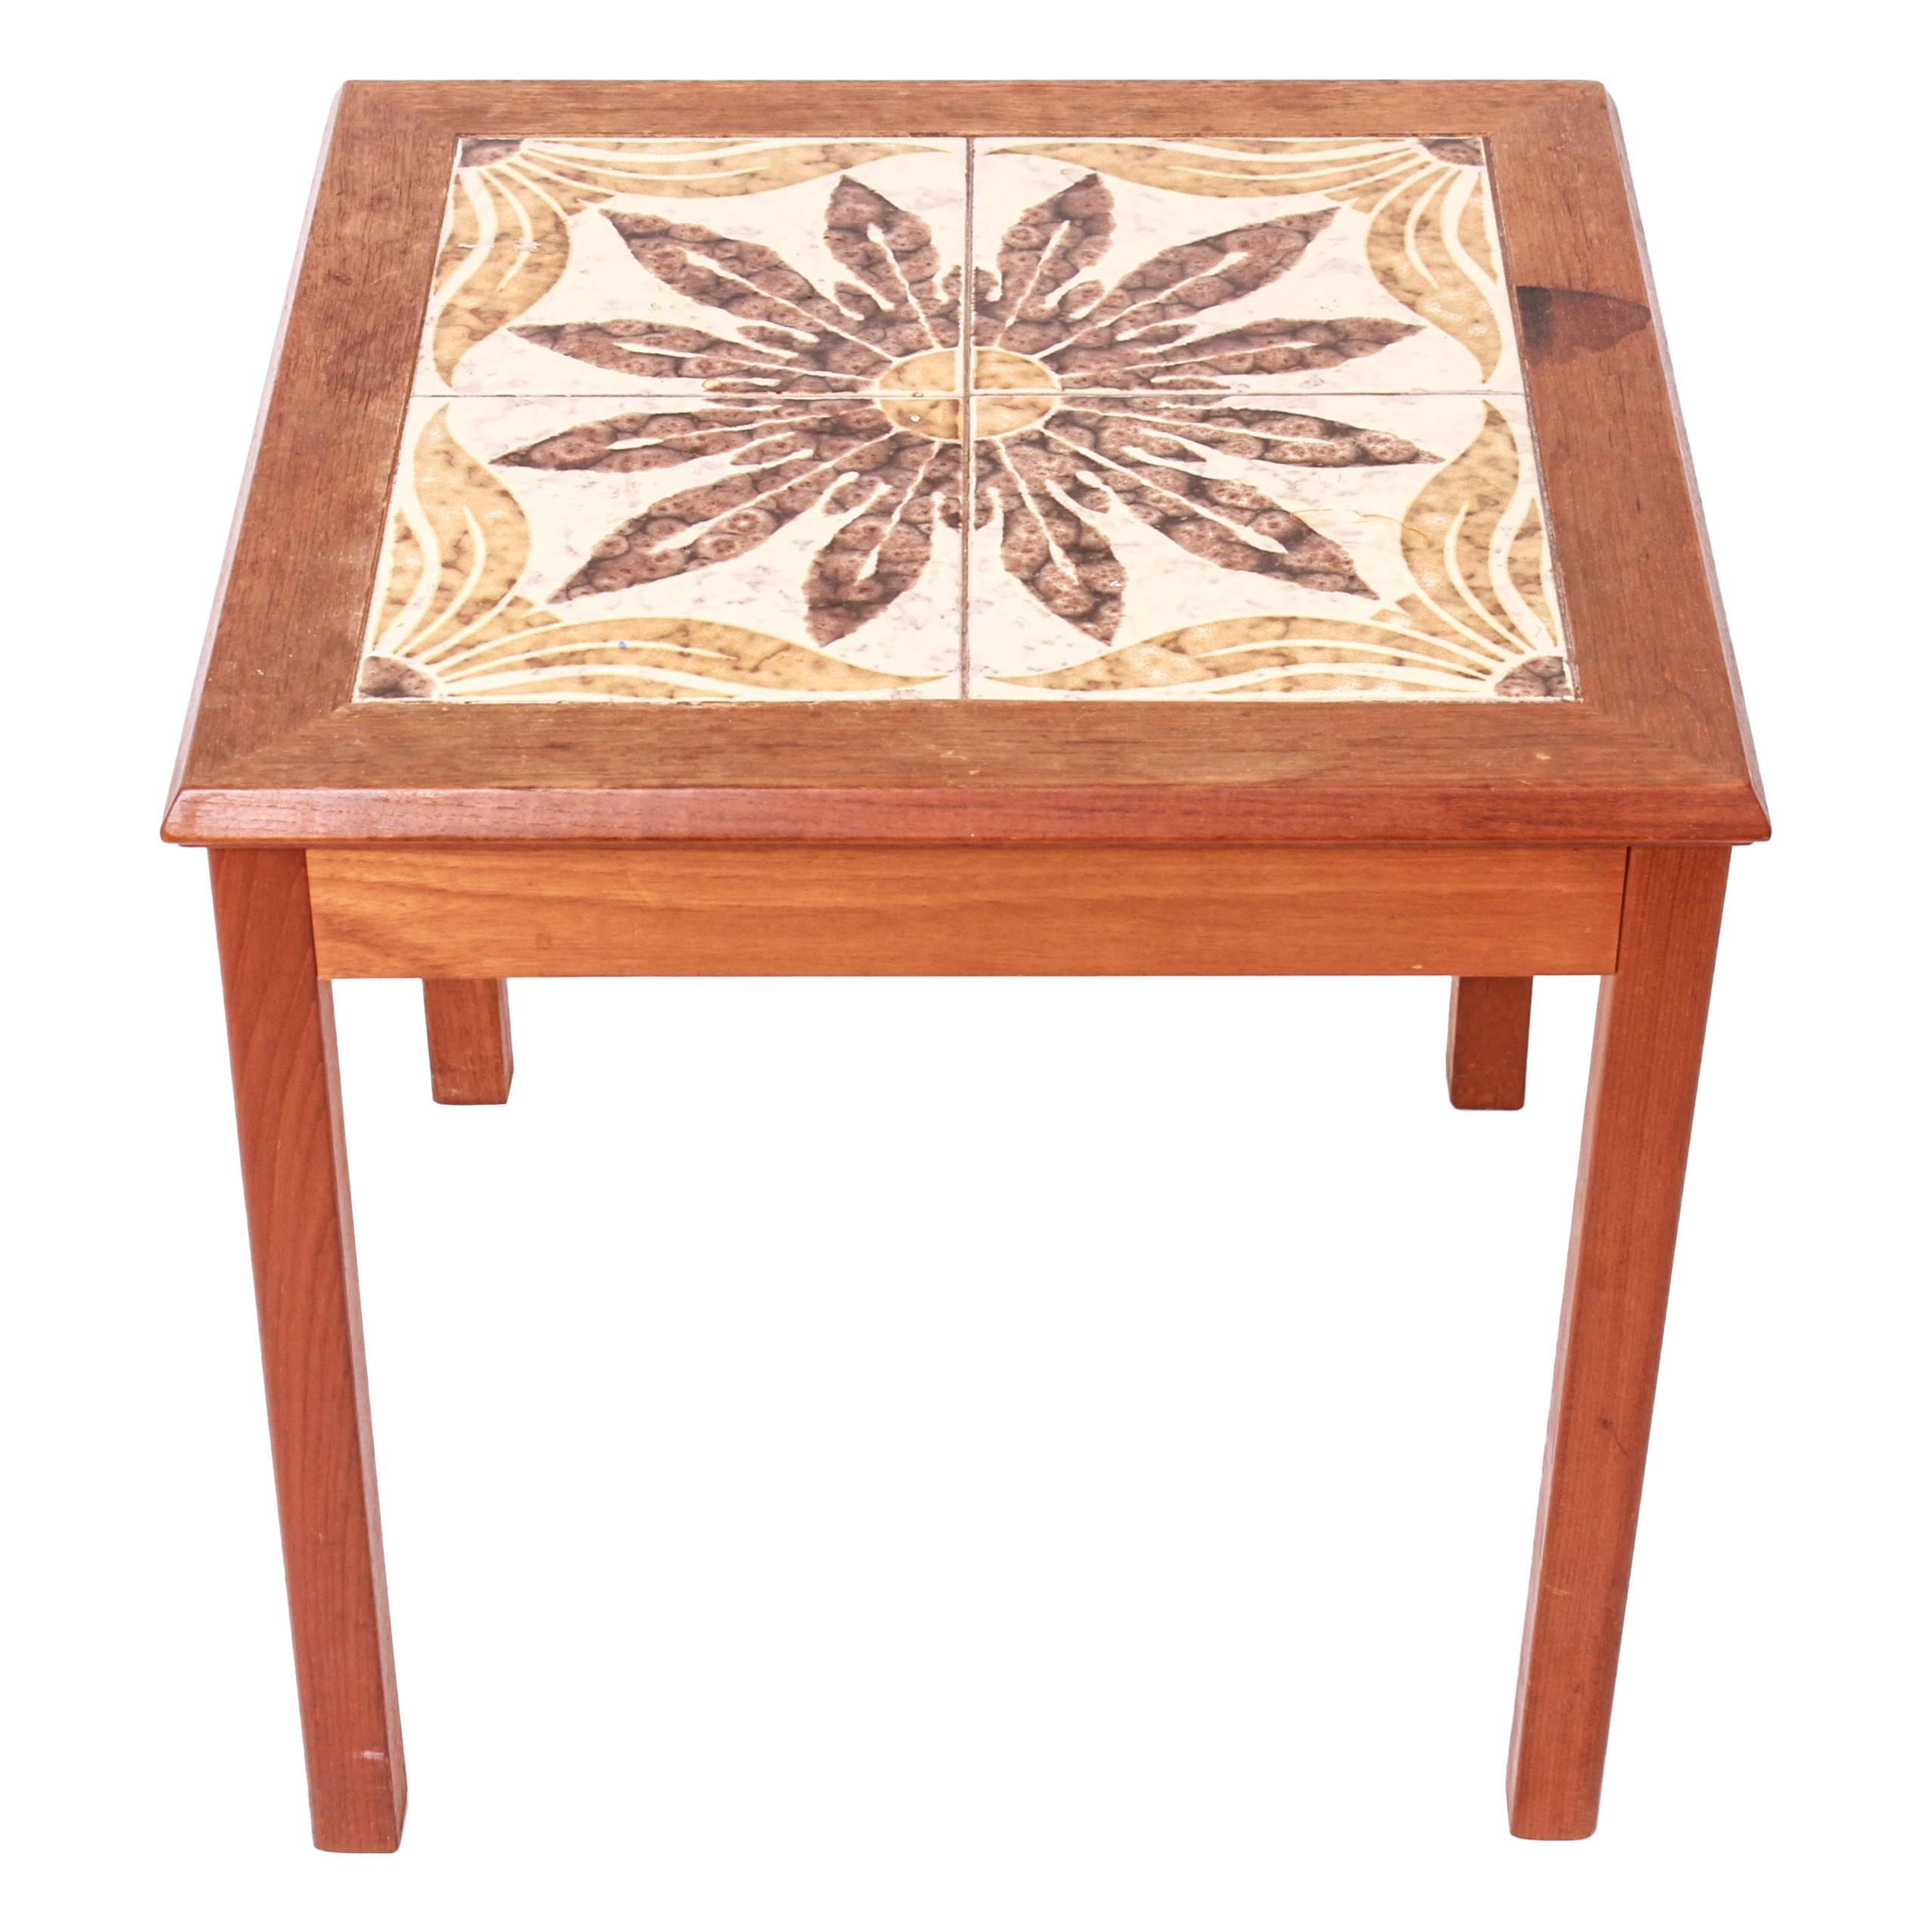 danish scandinavian modern side table with tiled top